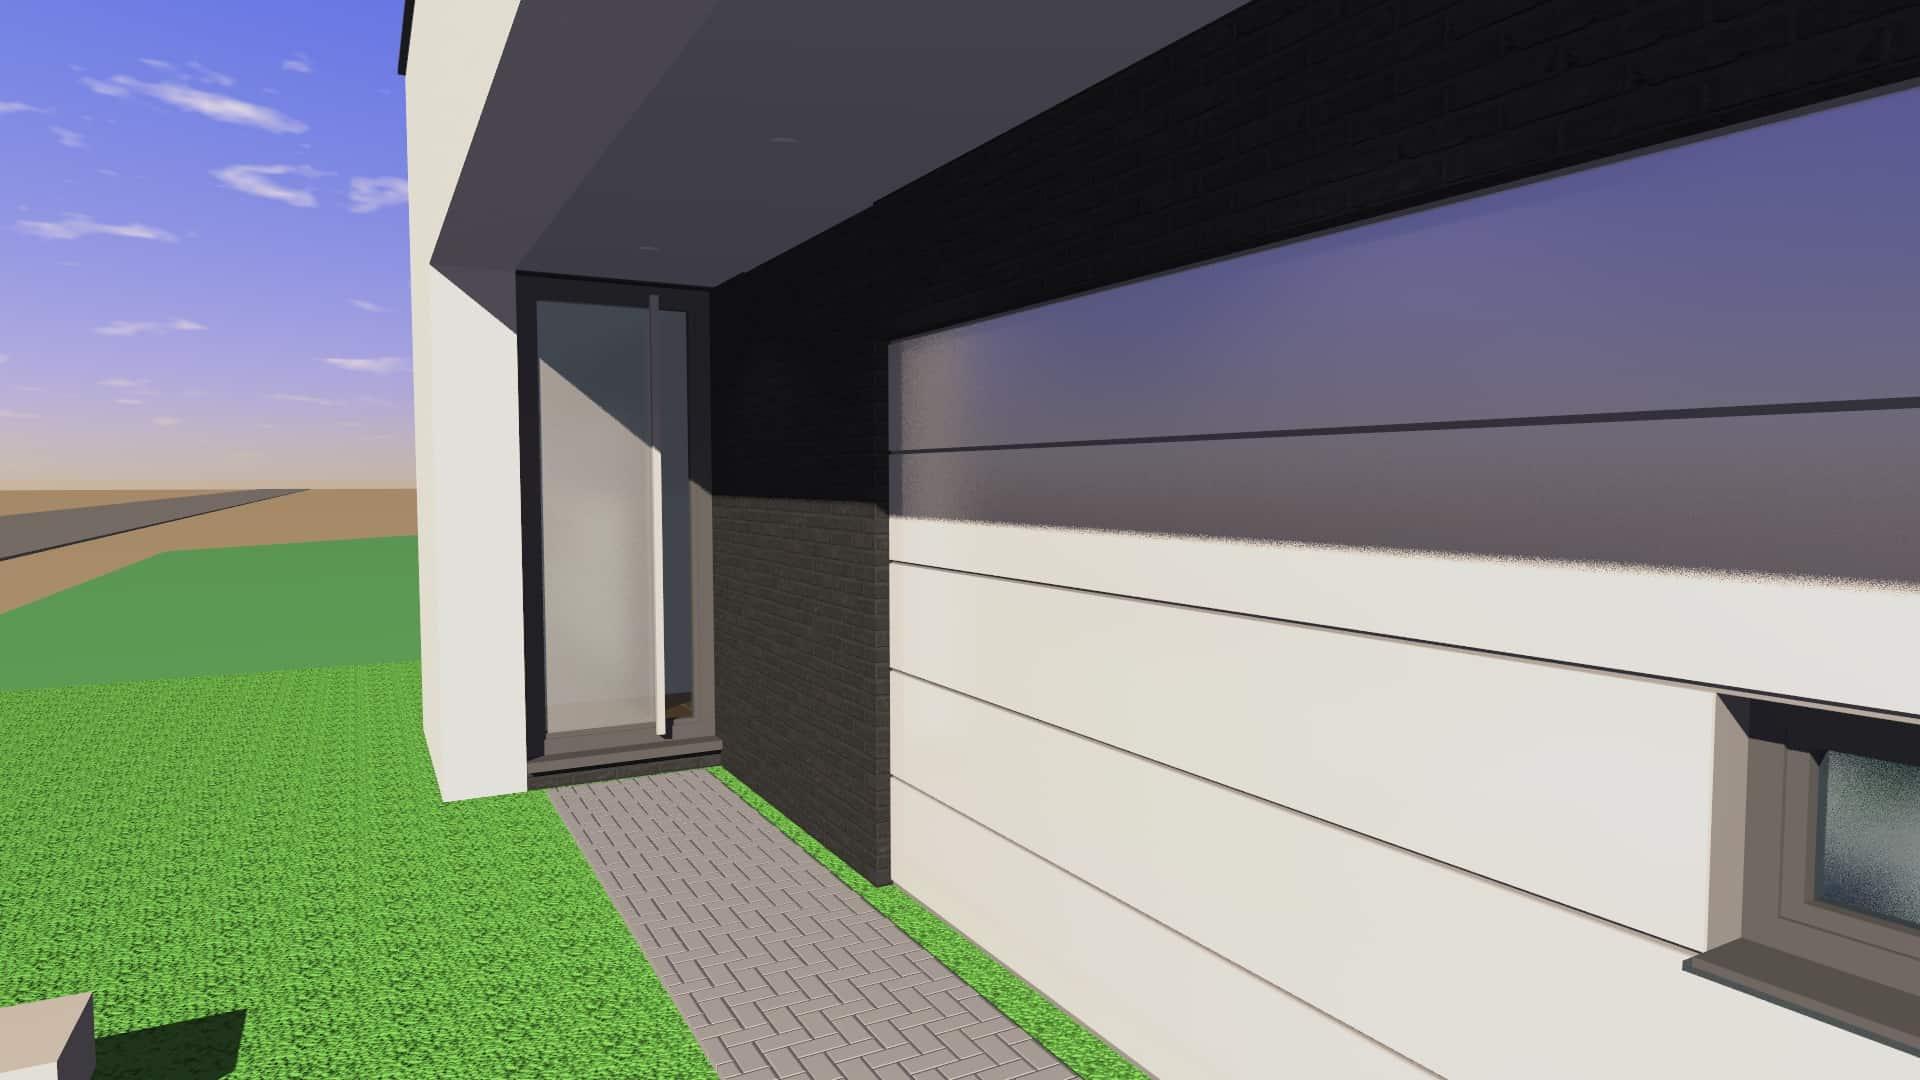 Detail afbeelding 1 van VM   –    Strakke Gezinswoning    –   Maasmechelen | Ontwerp door architect Patrick Strackx